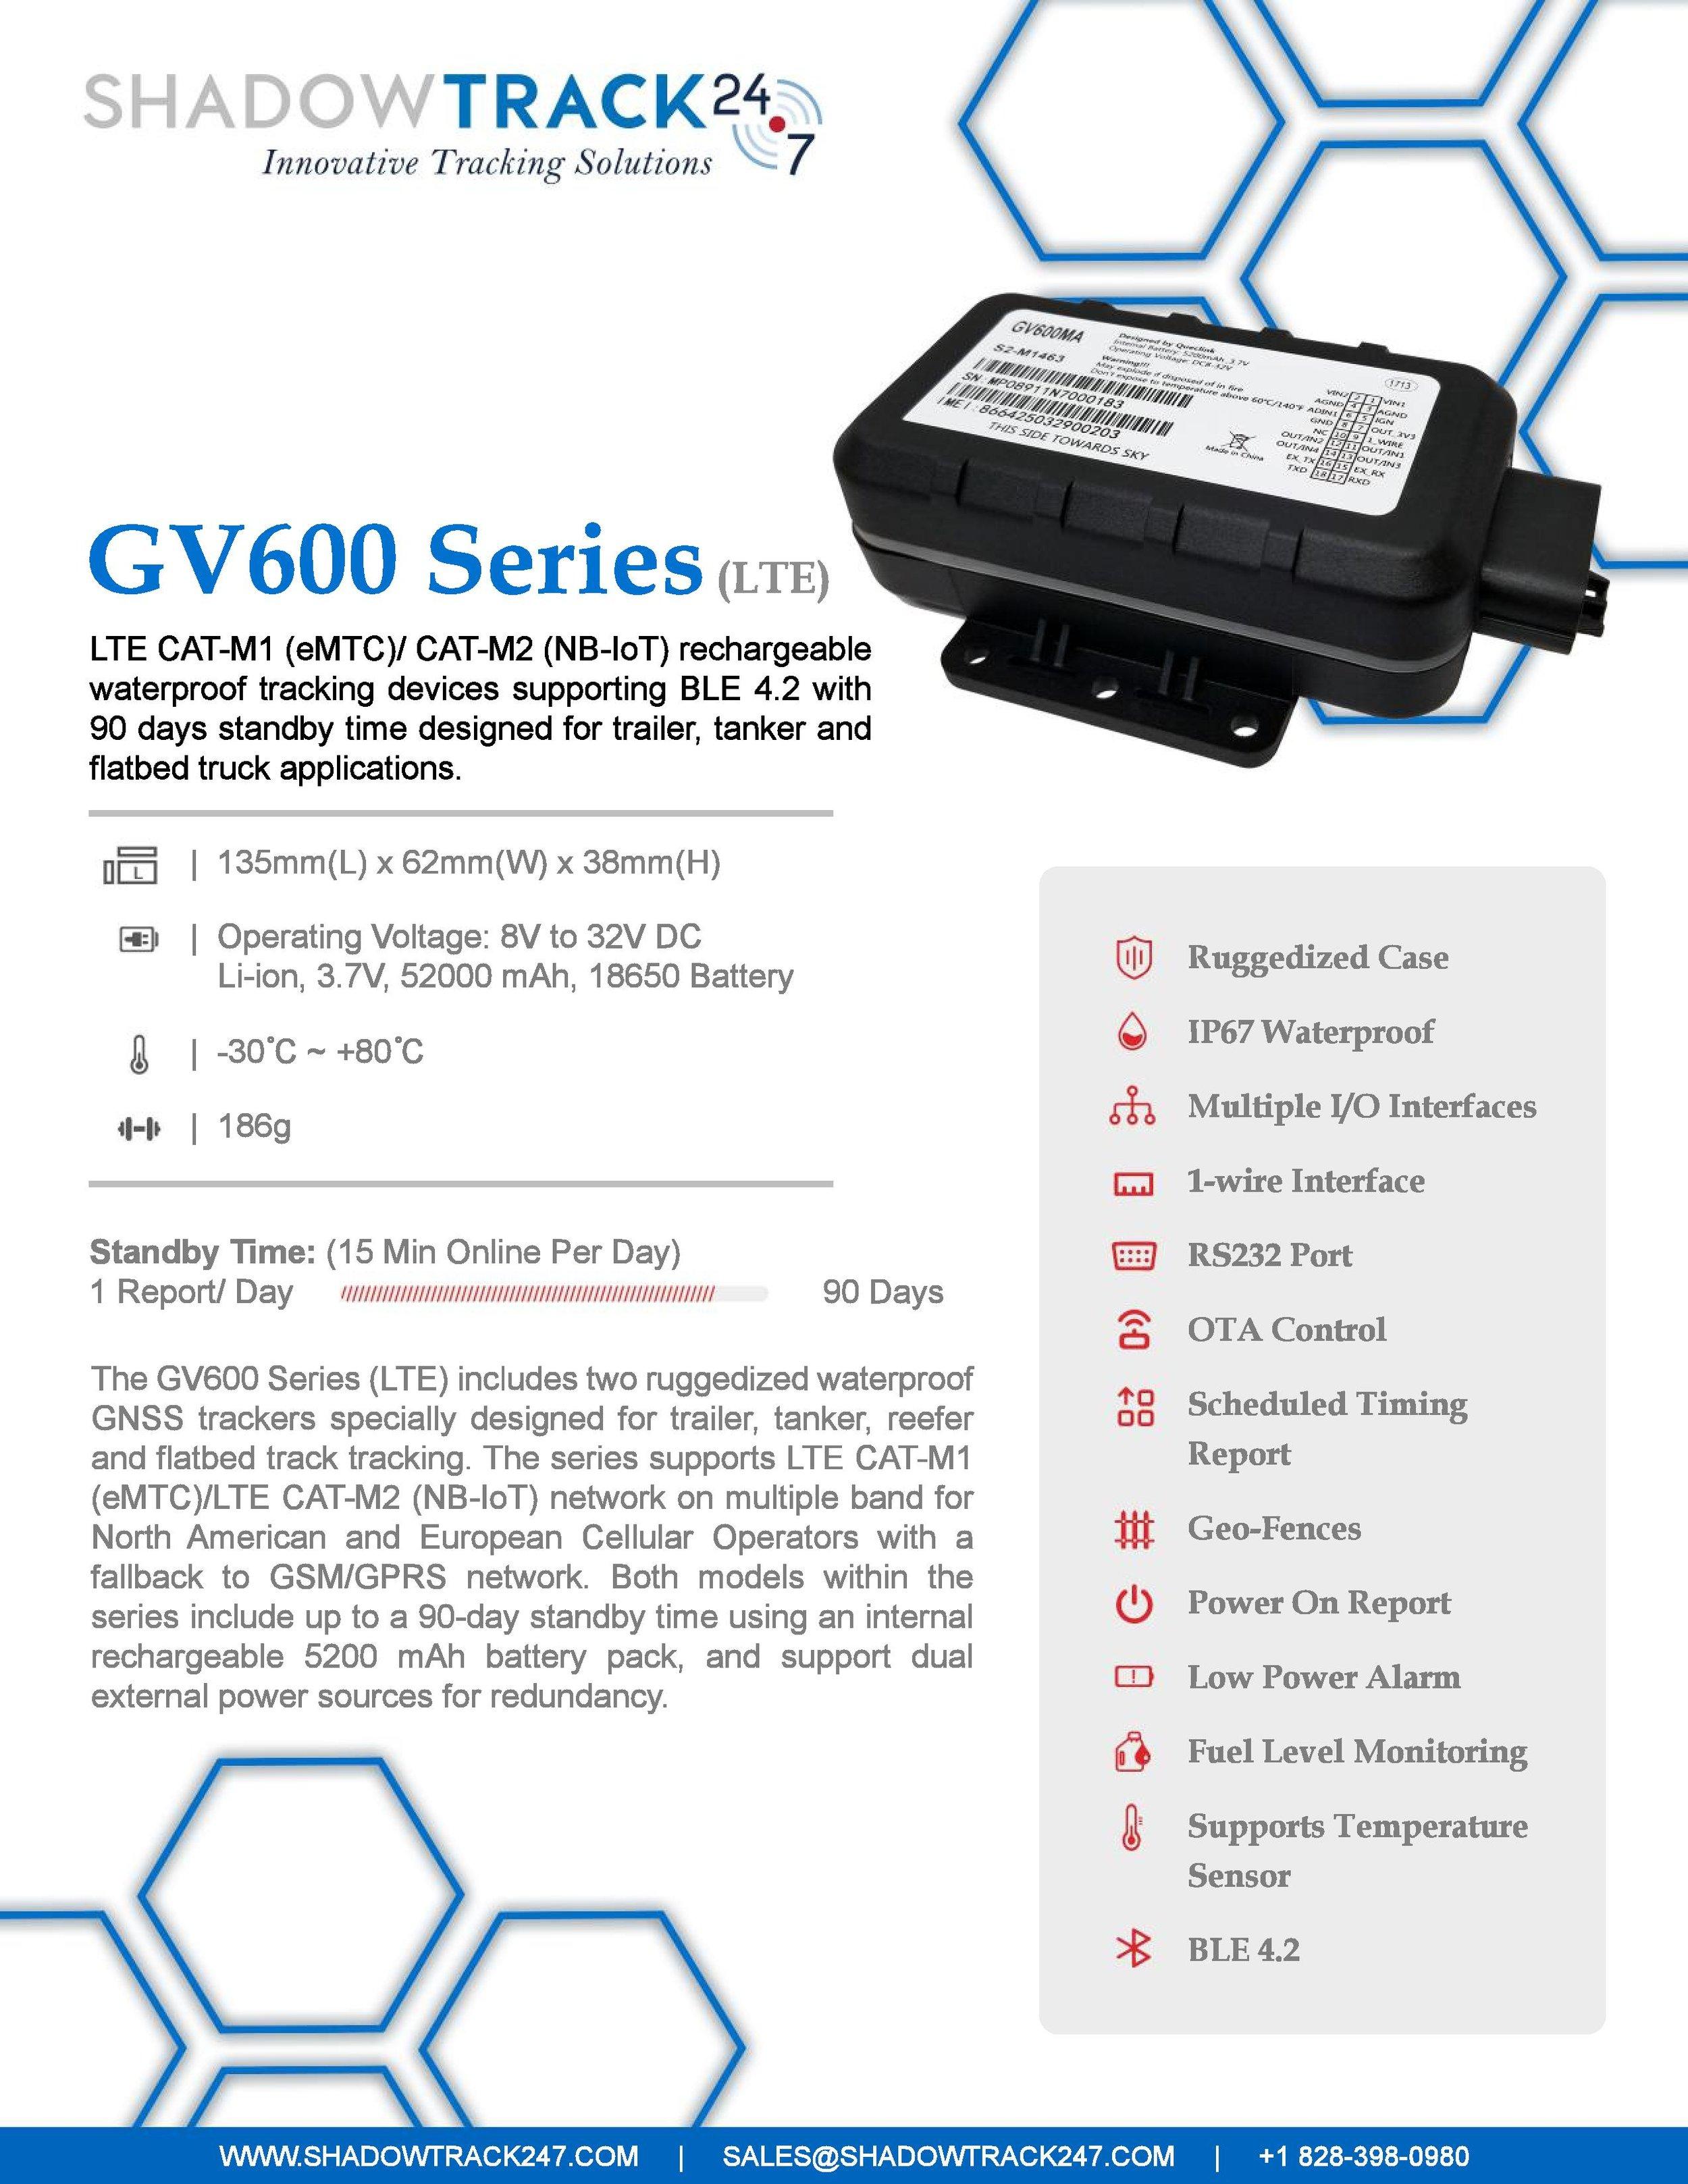 ST 247 GV600 LTE Series (1)-page-001.jpg